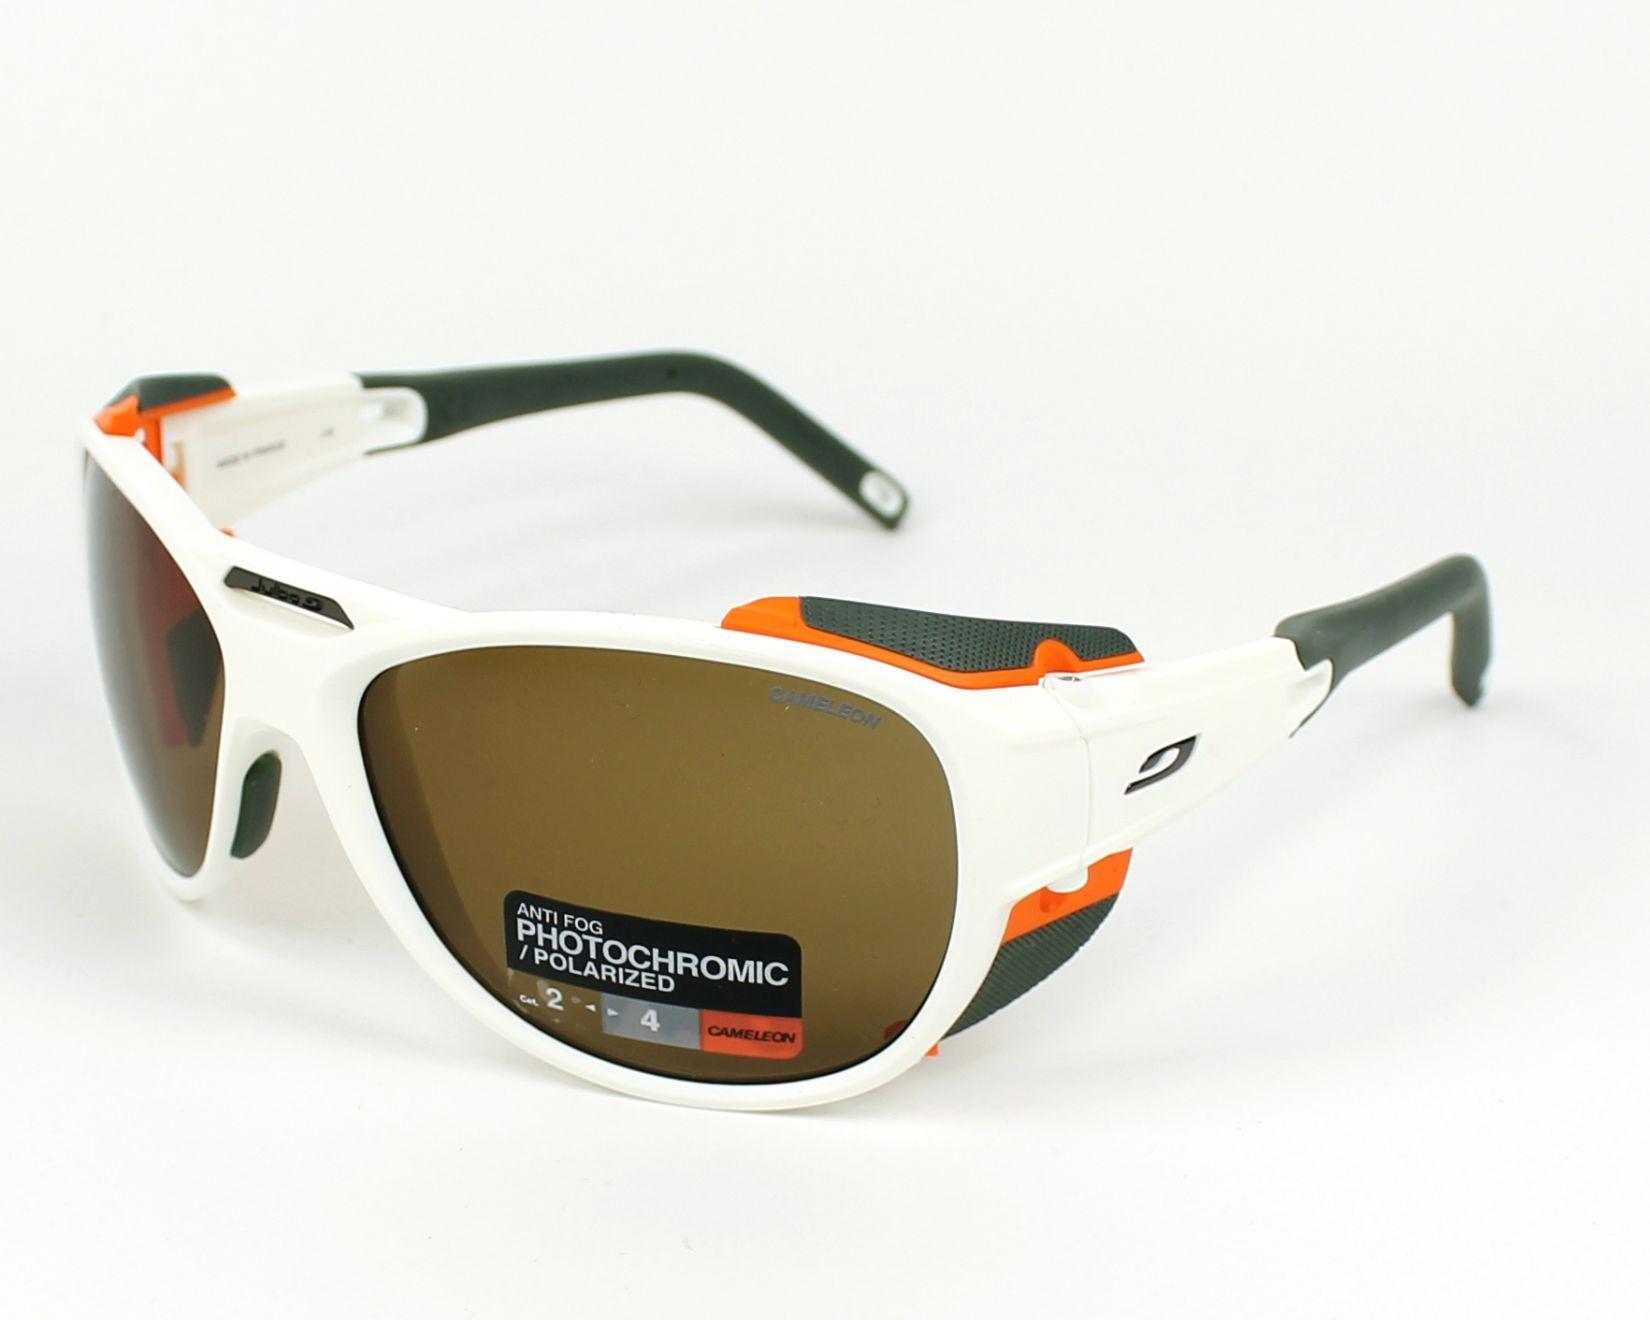 ab4bae16bd Gafas de sol Julbo J497 5011 - Blanco Naranja vista de perfil